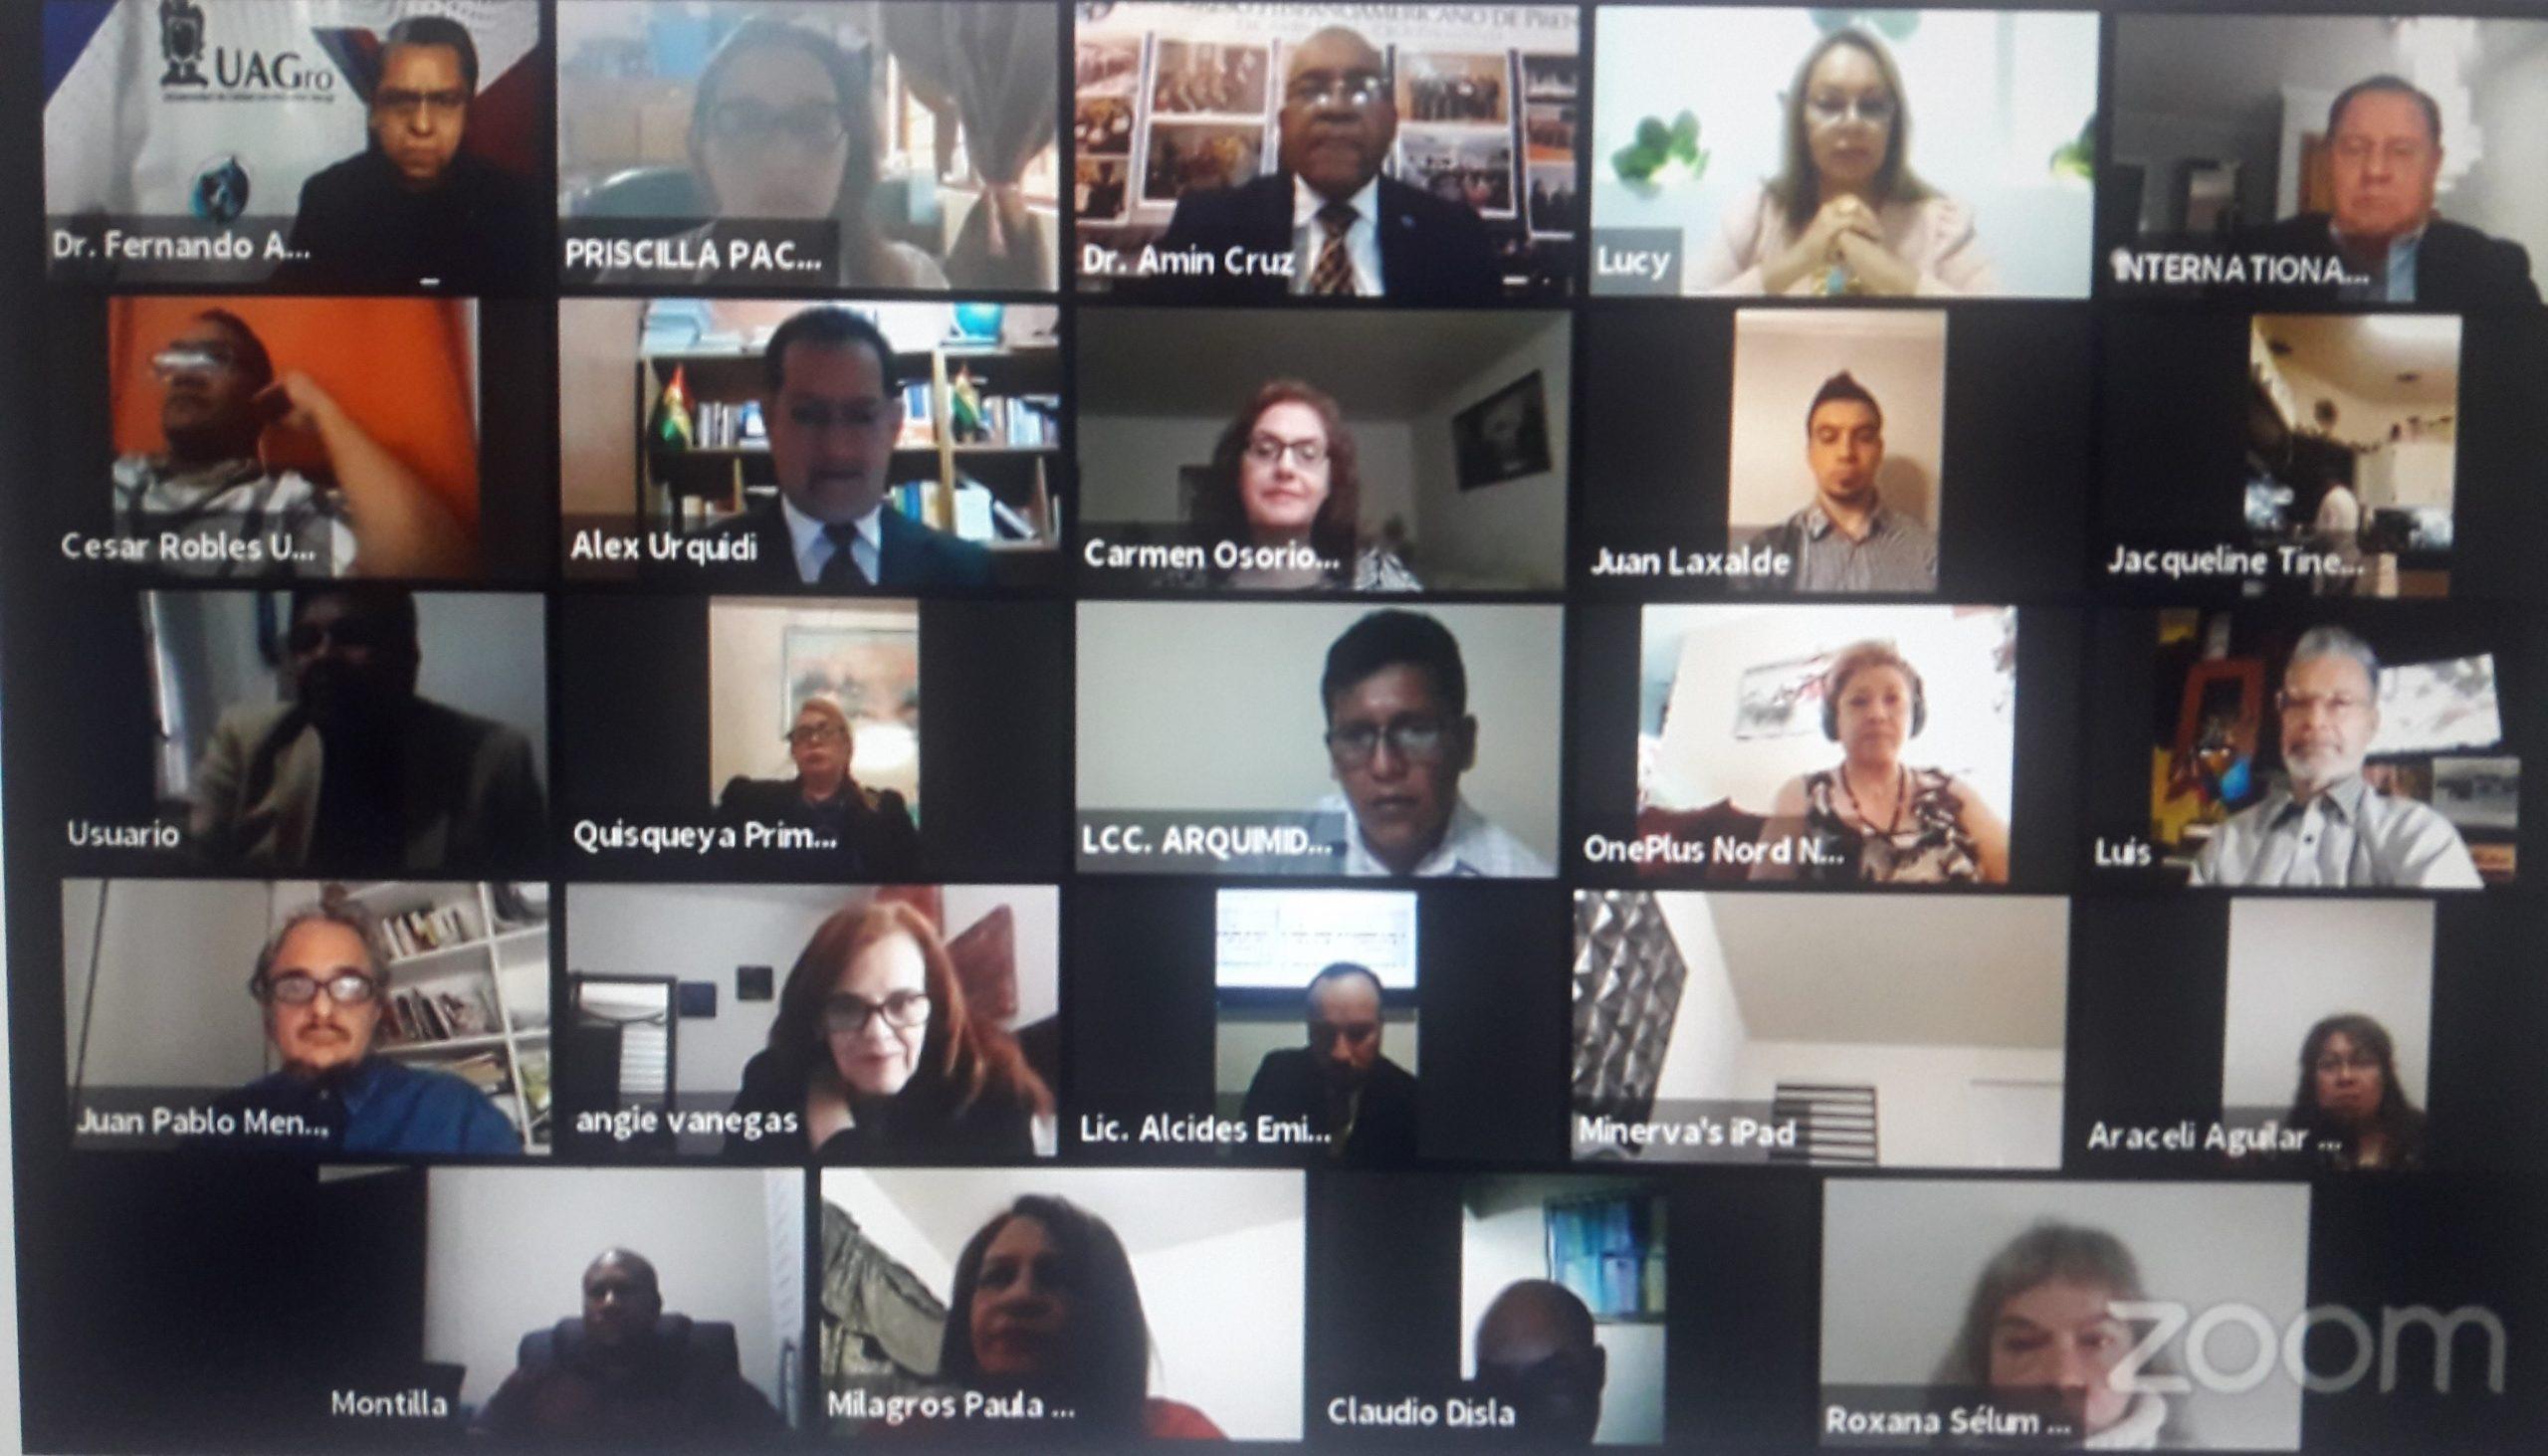 Foto virtual del XXIII Aniversario del Congreso Hispanoamericano de Prensa